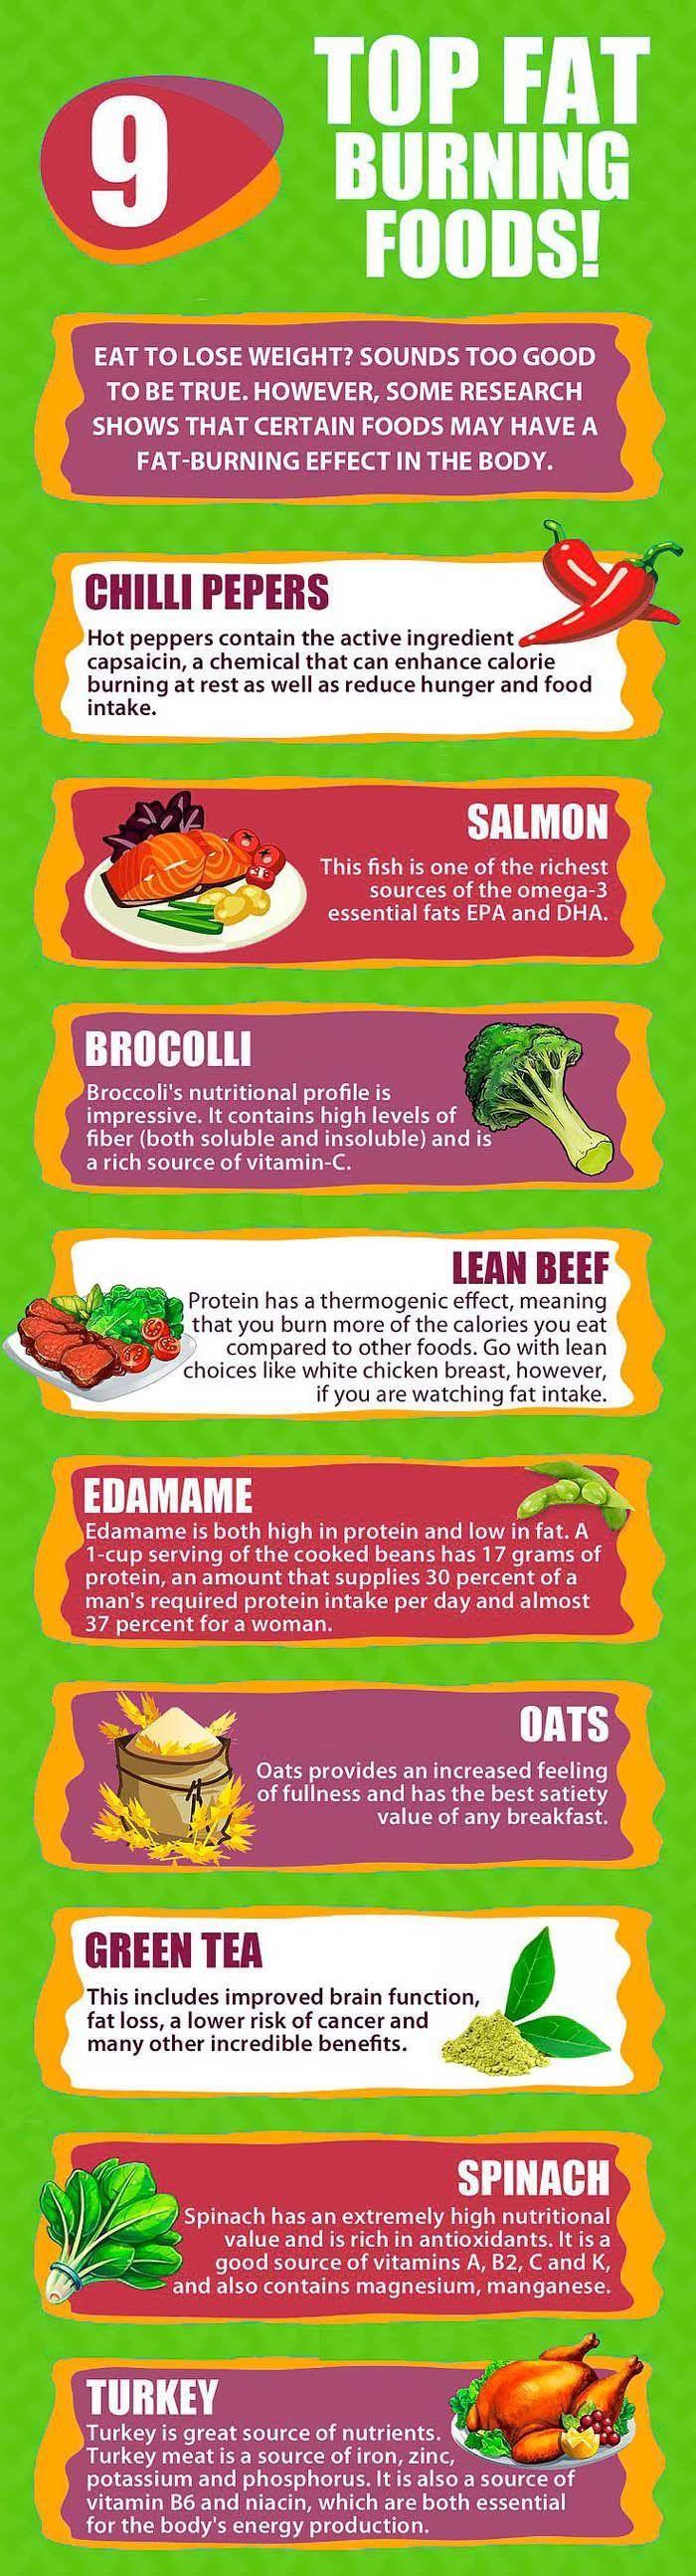 9 top fat-burning foods